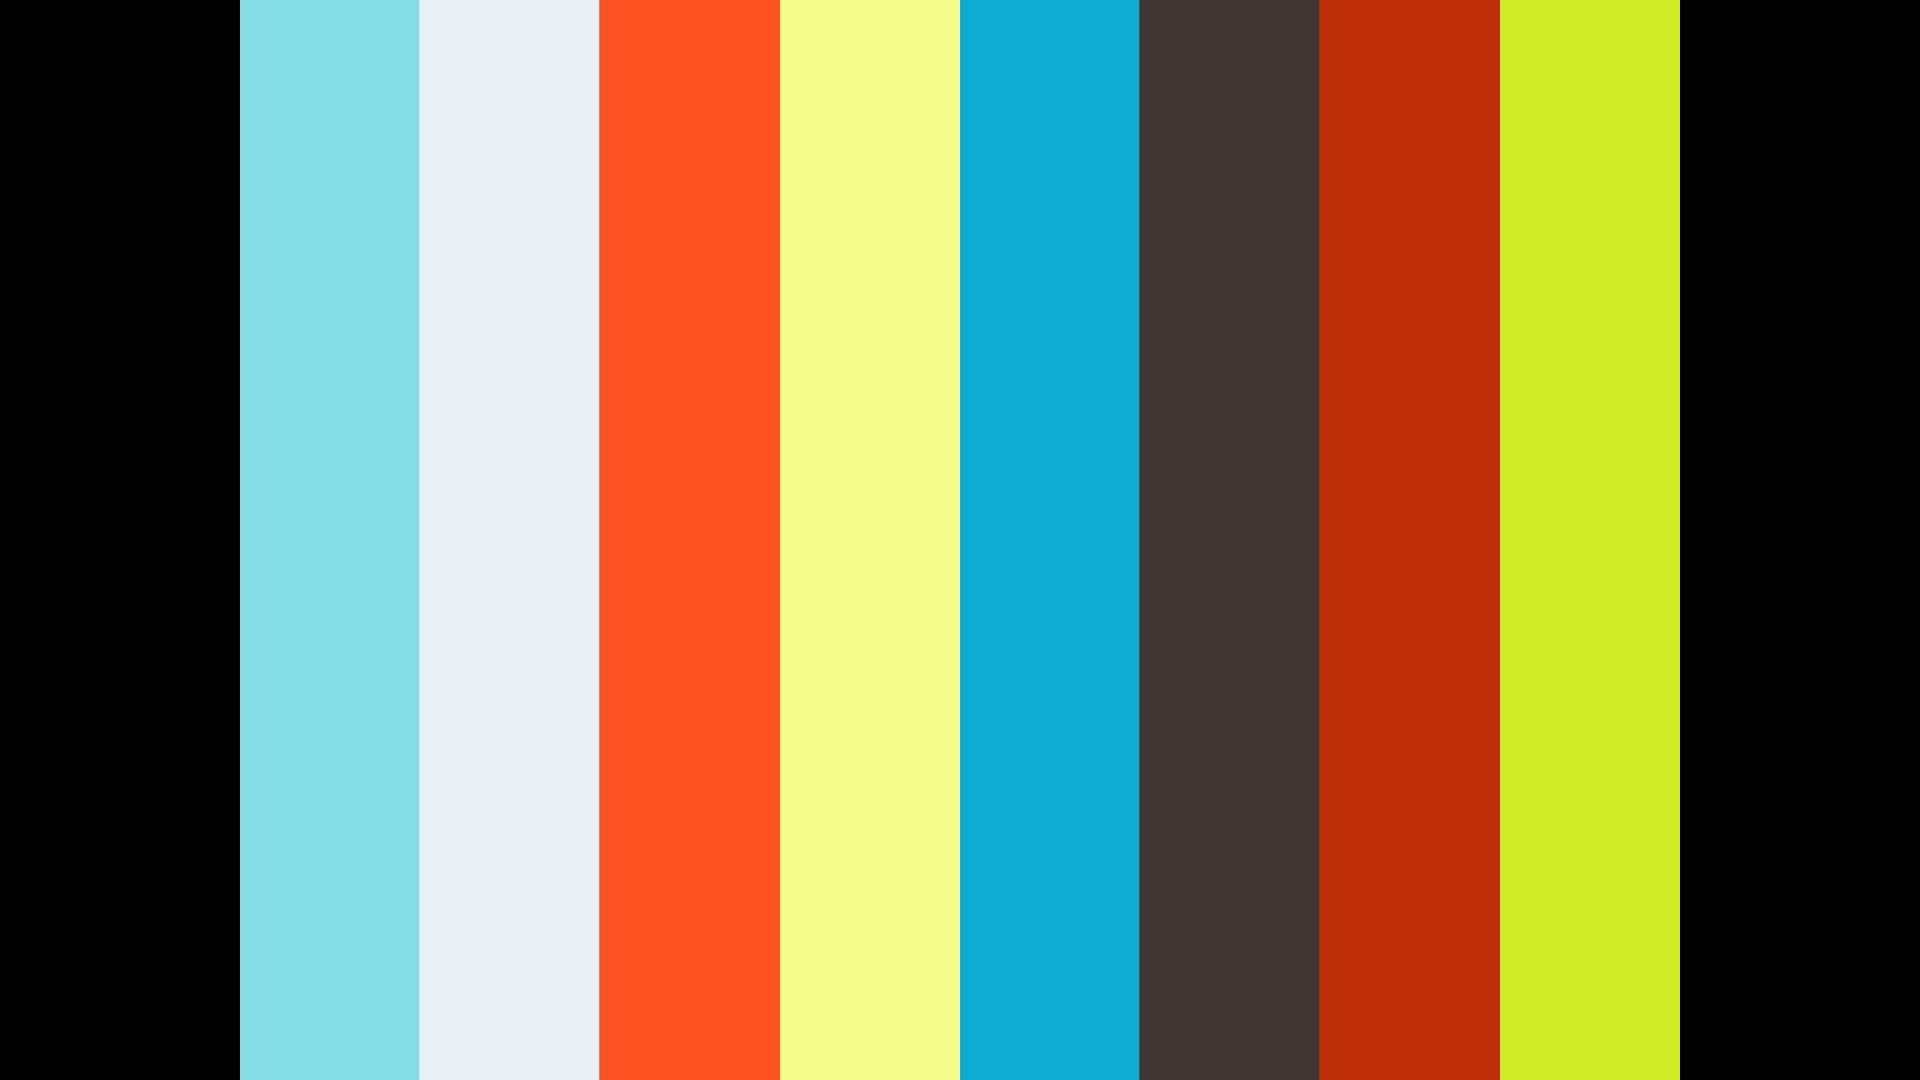 2020-06-27 Ilot REDIKA - SKYVIEW - NC